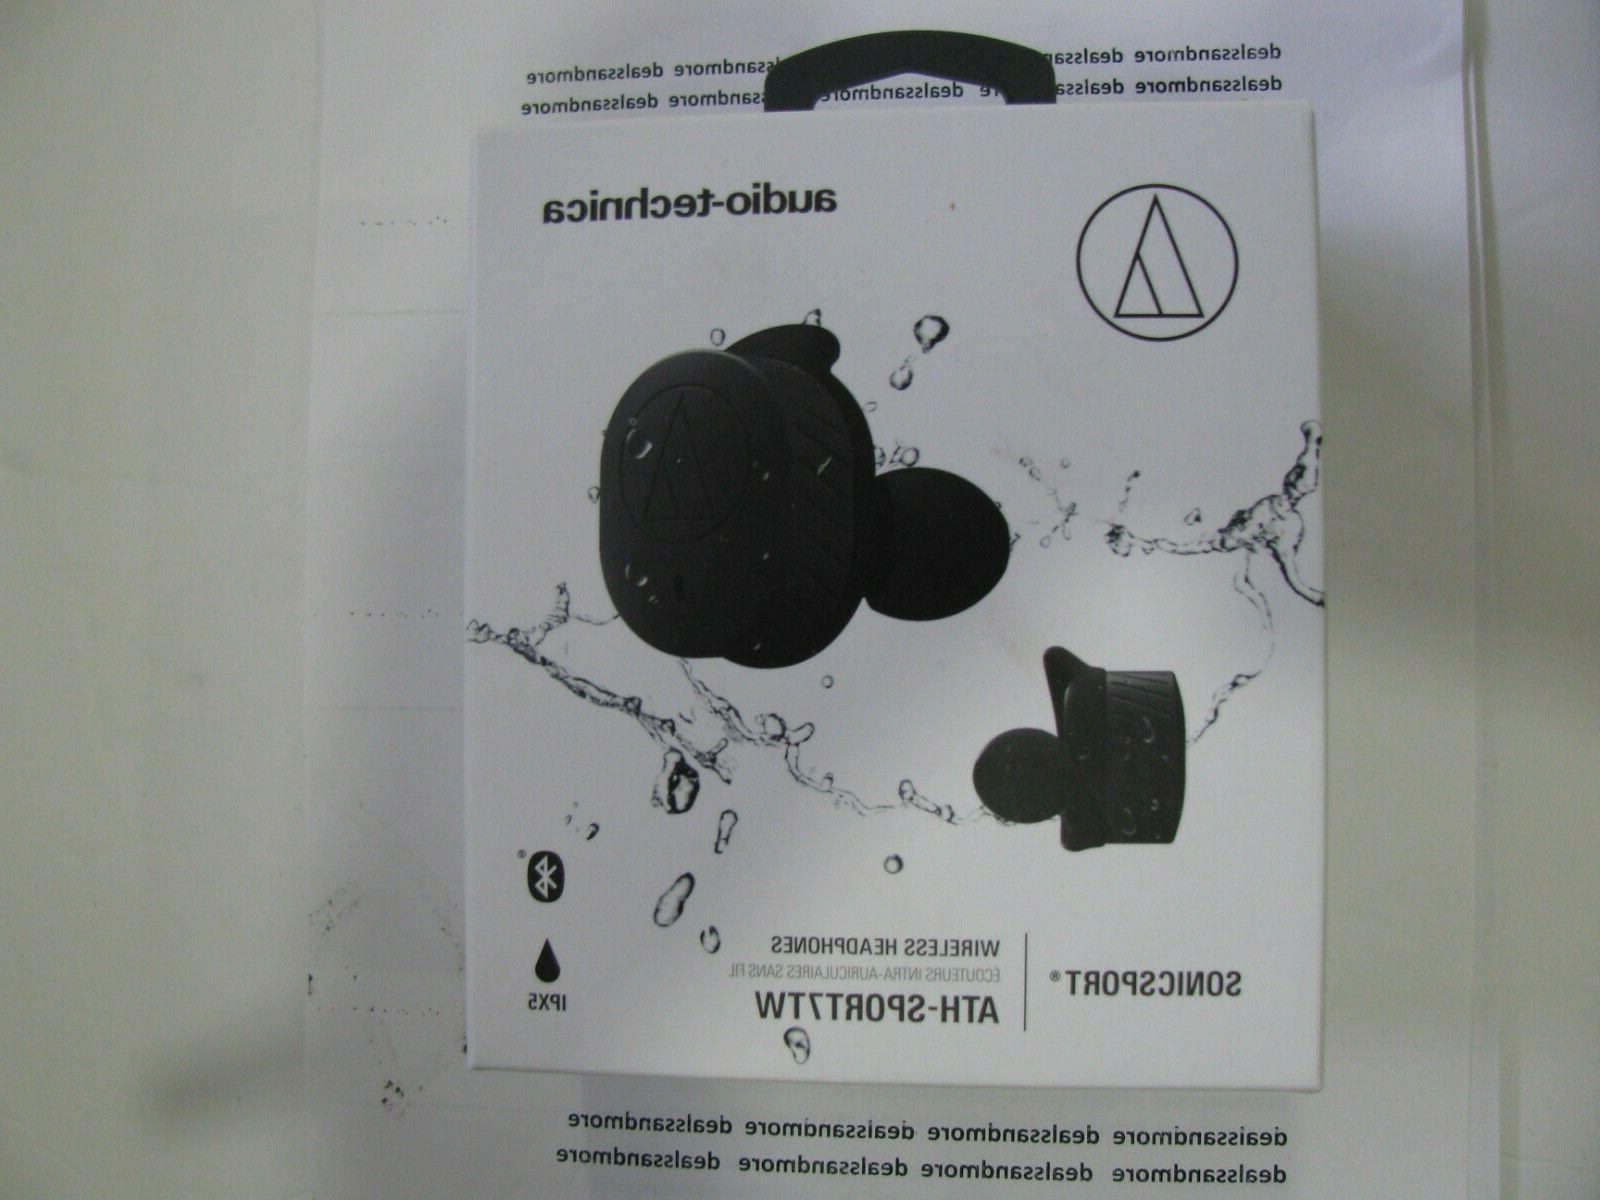 audio technica sonicsport true wireless sports earbuds